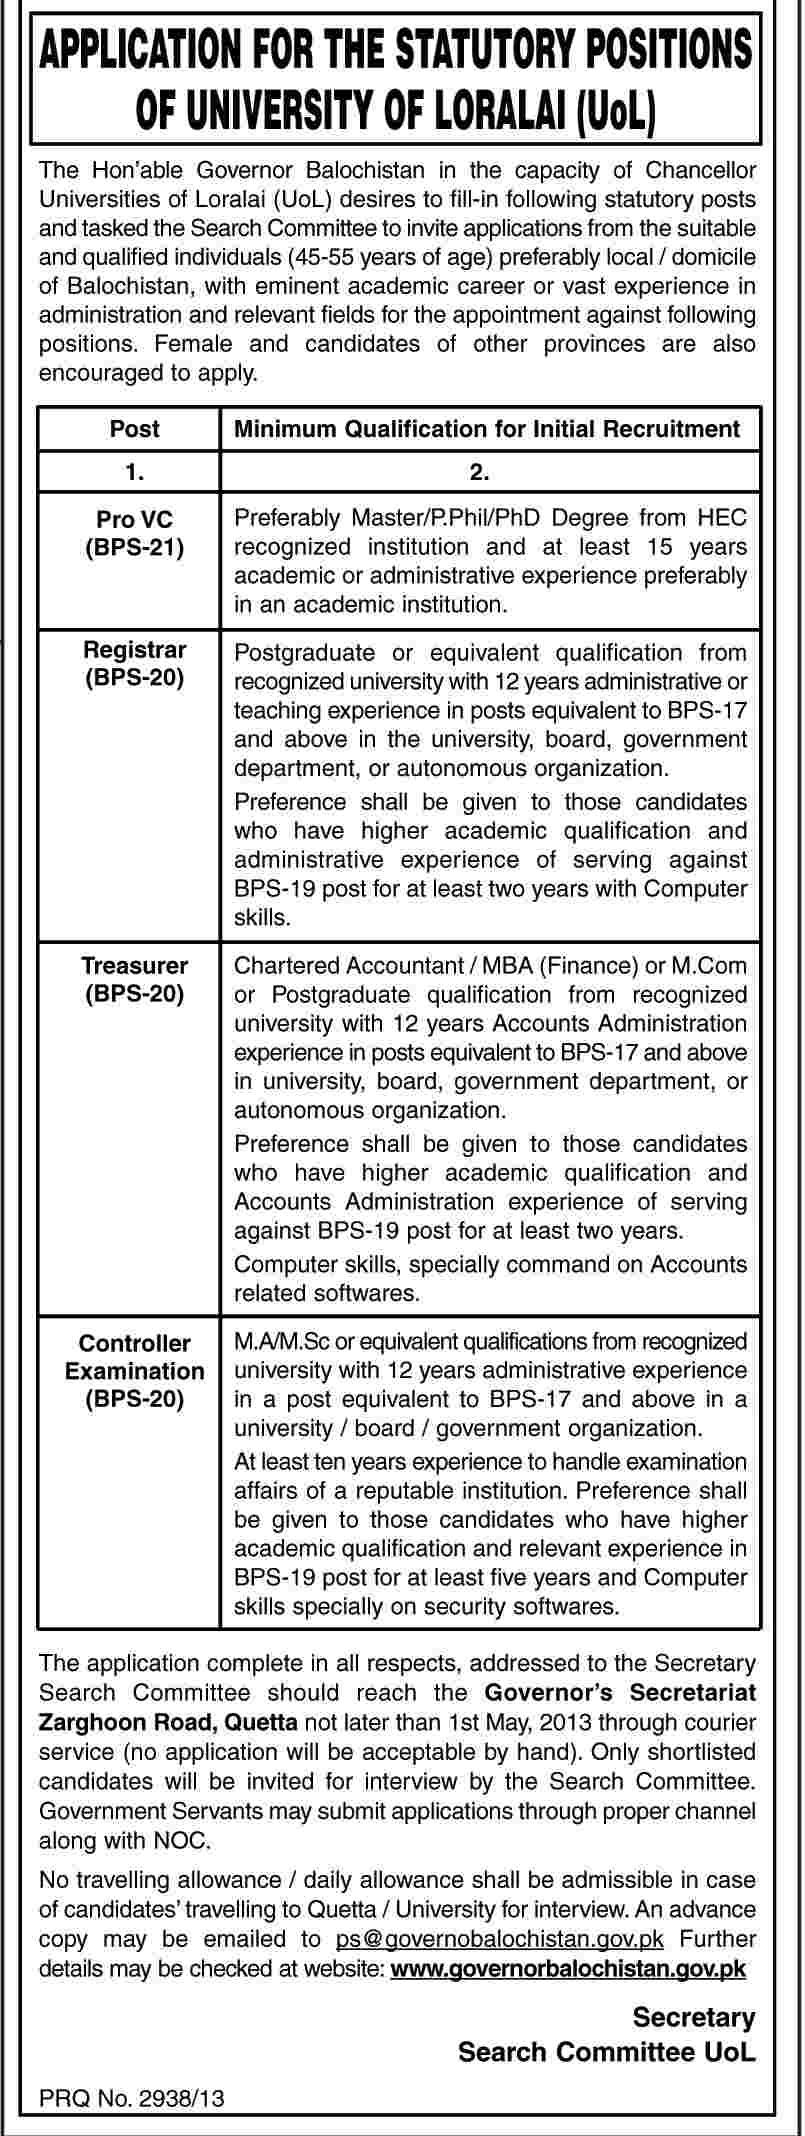 Jobs for Pro V.C, Controller & Registrar in University of Loralai (UOL)